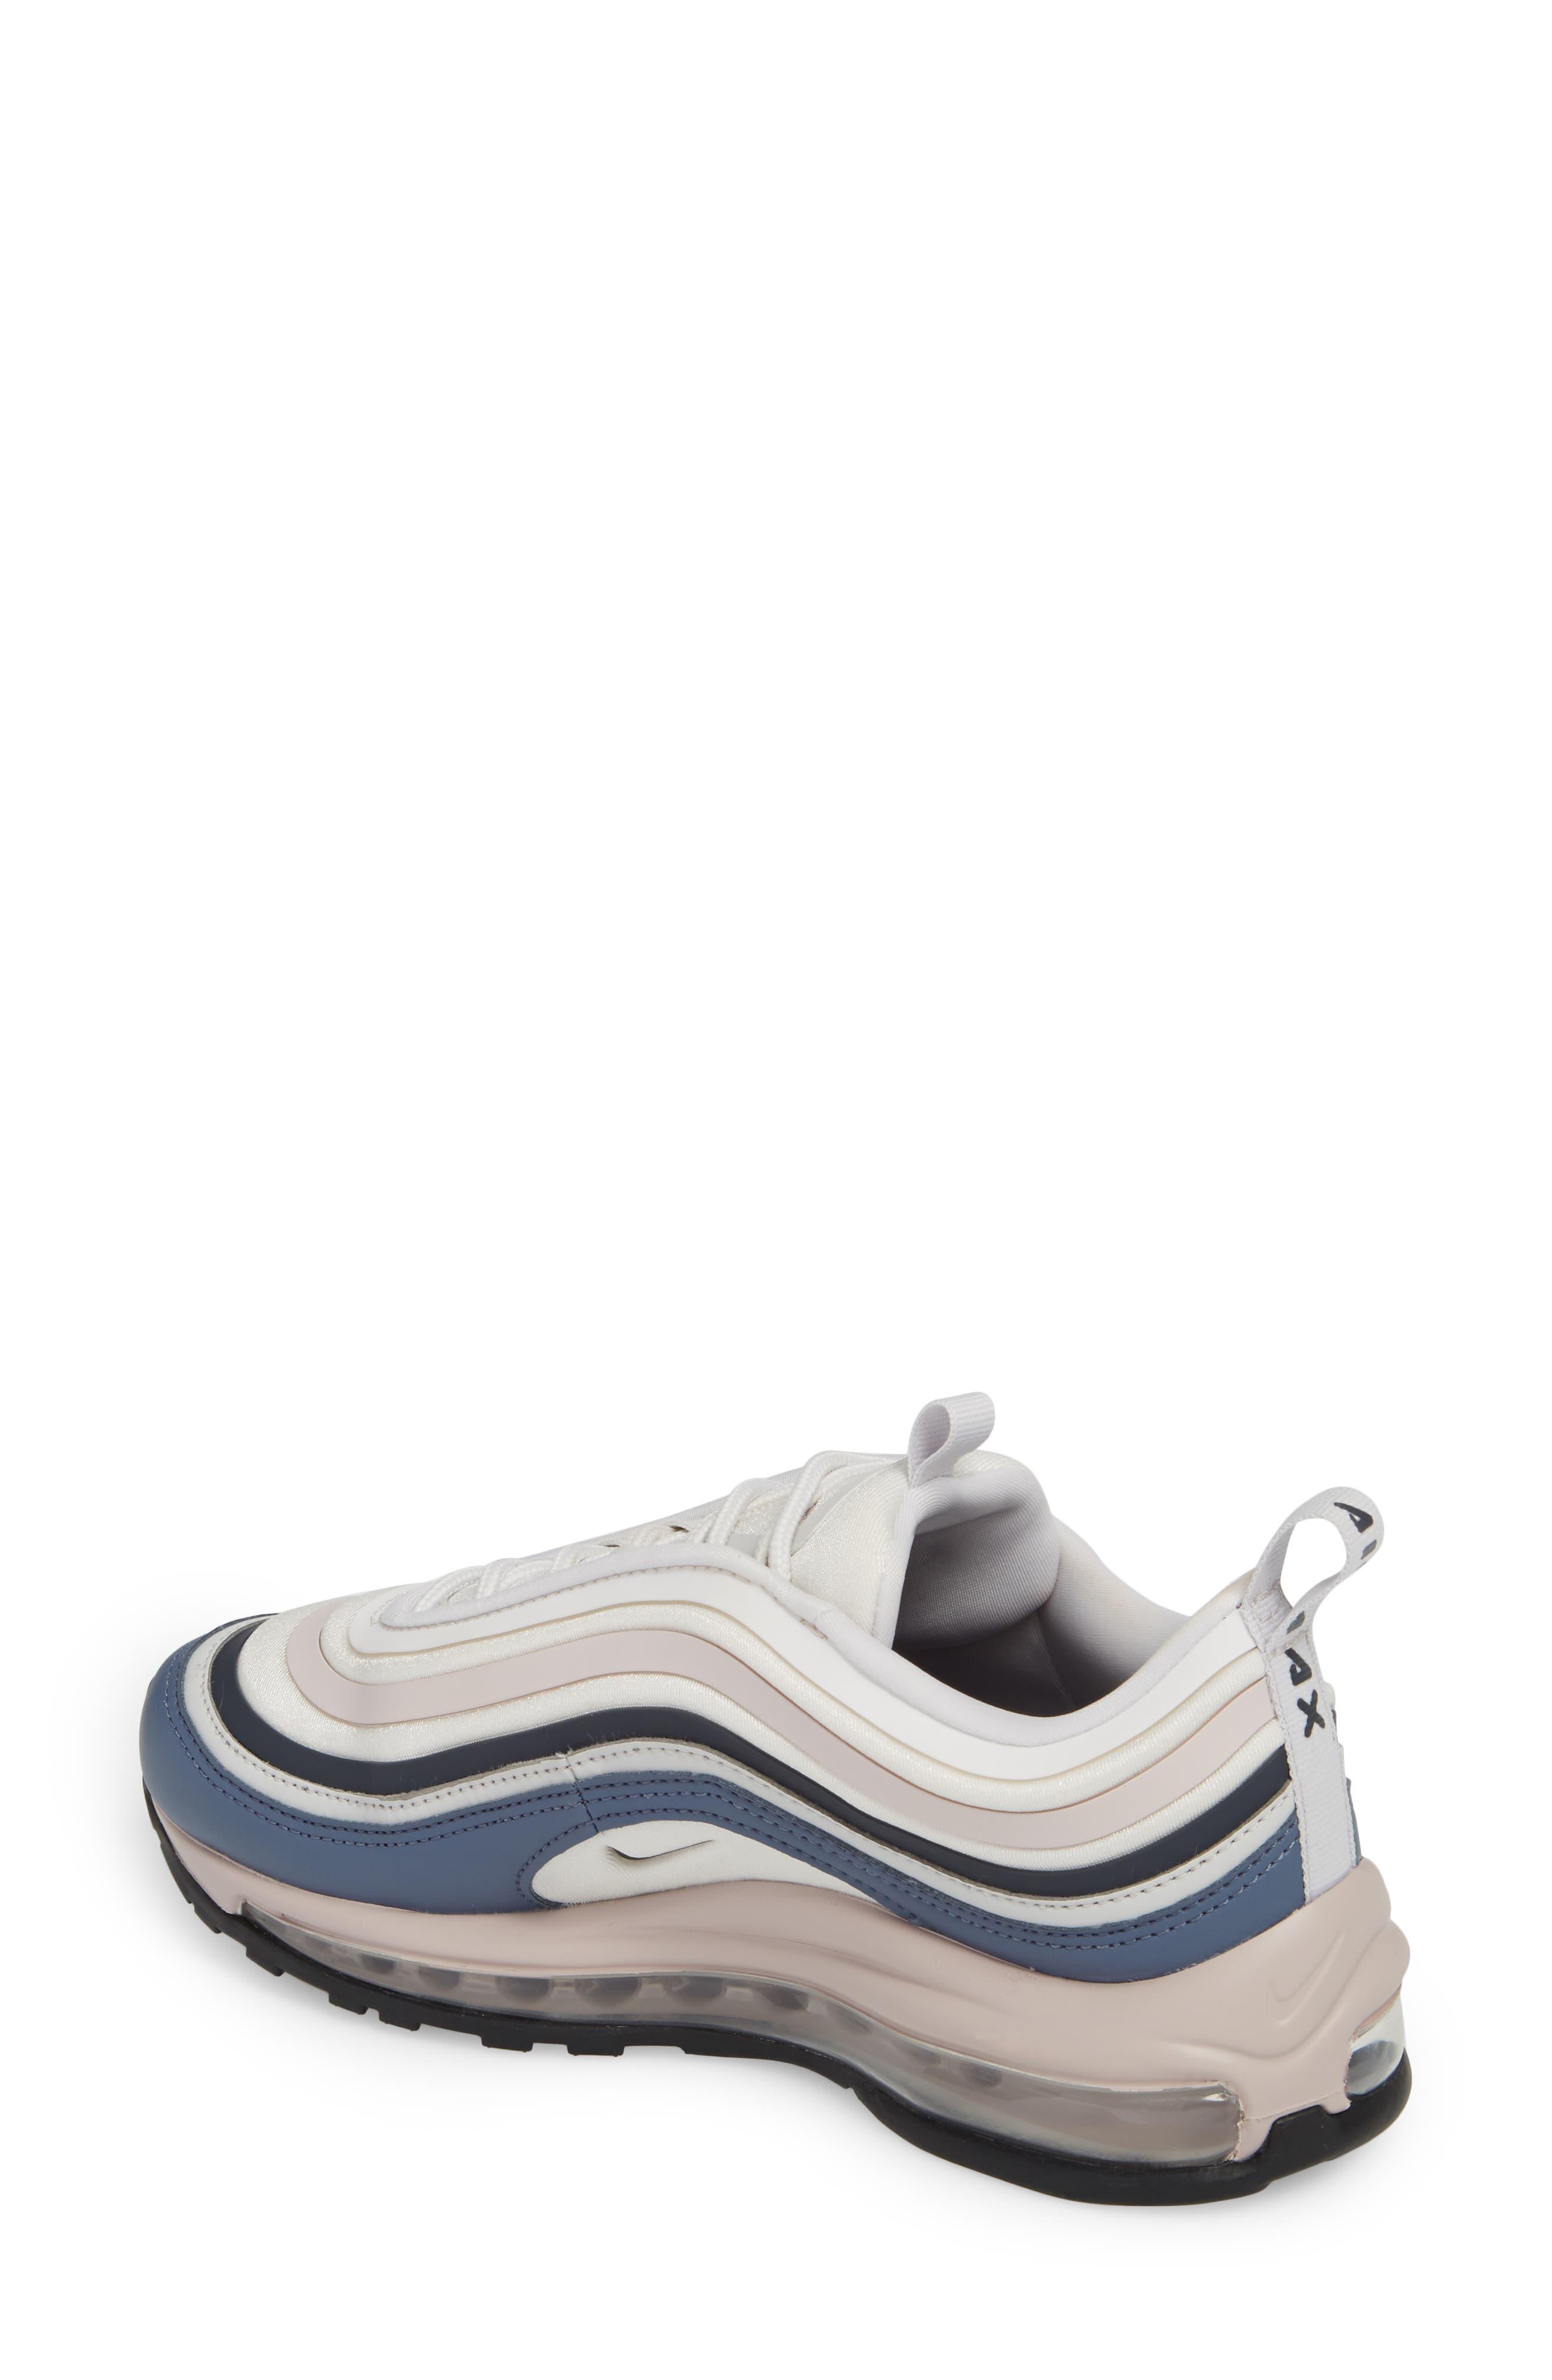 Air Max 97 Ultralight 2017 Sneaker,                             Alternate thumbnail 12, color,